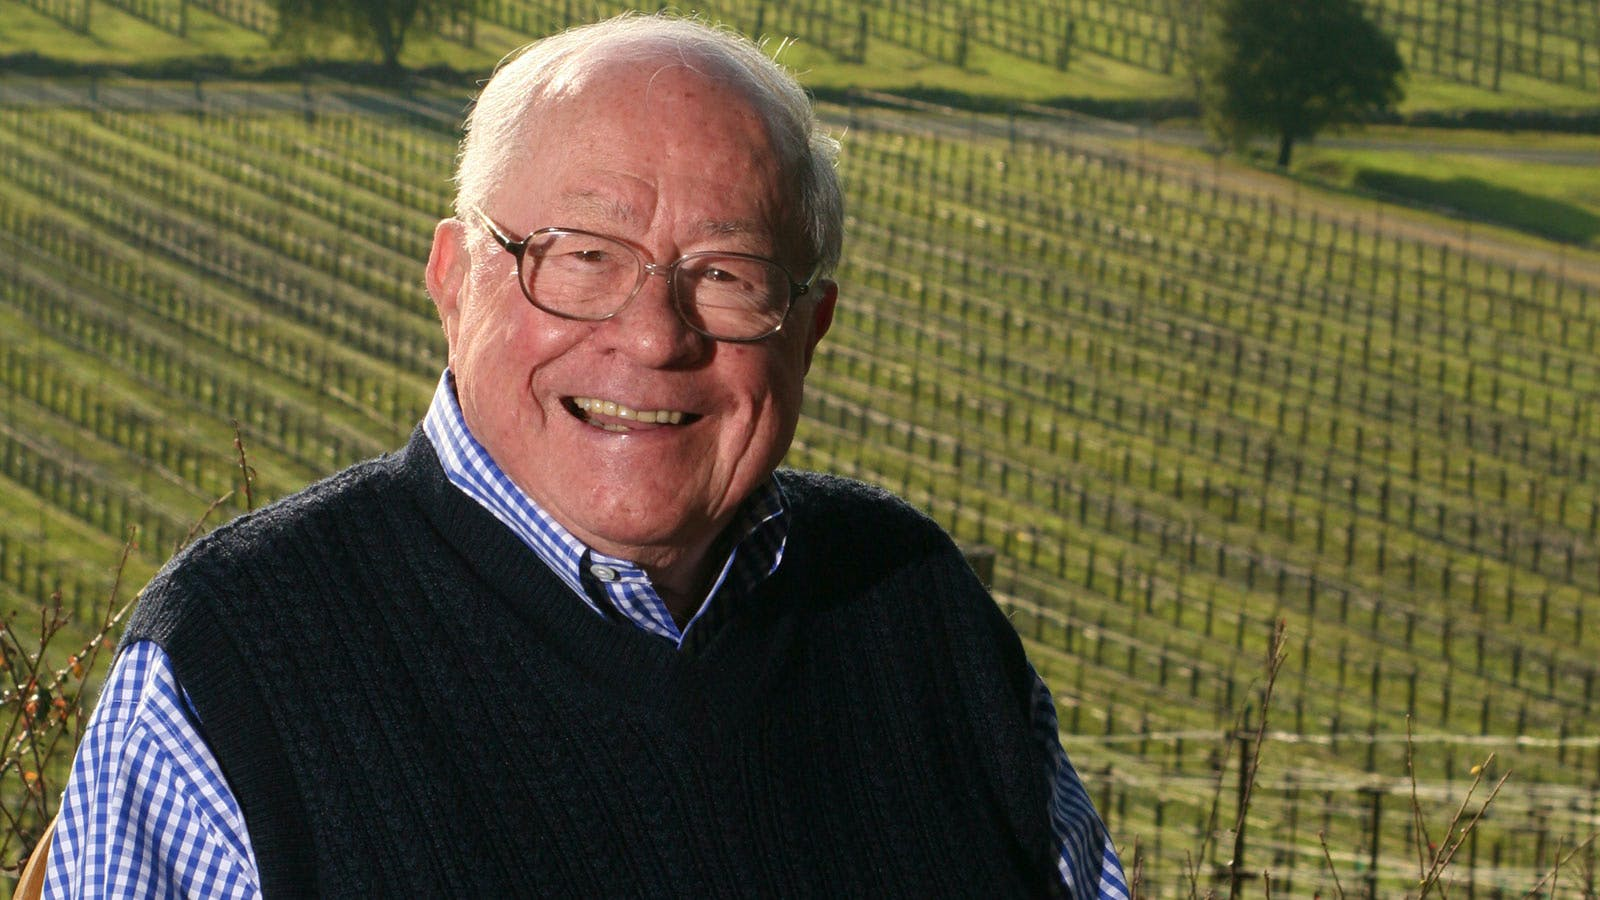 Joseph Phelps, Pioneering California Wine Producer, Dies at 87